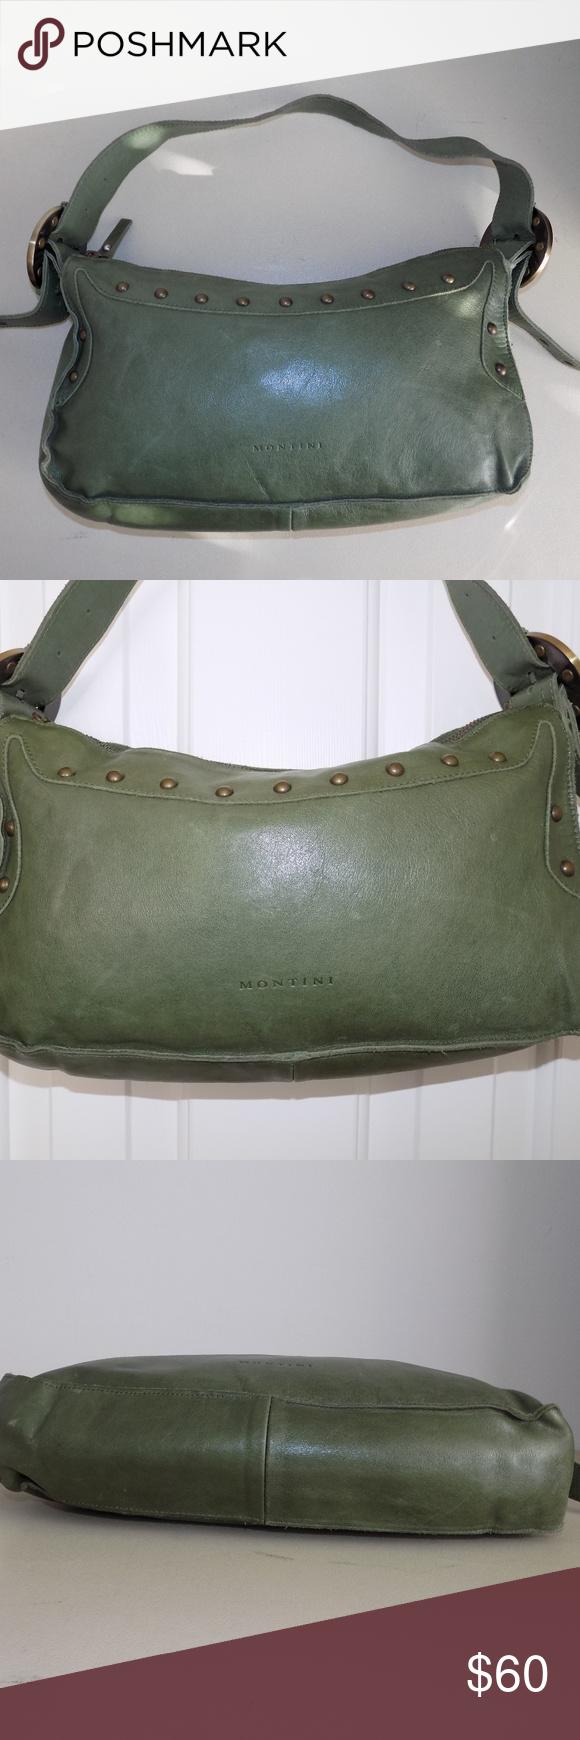 b4e2296e239d MONTINI Italian Leather Green Studded Purse Cute!! MONTINI green